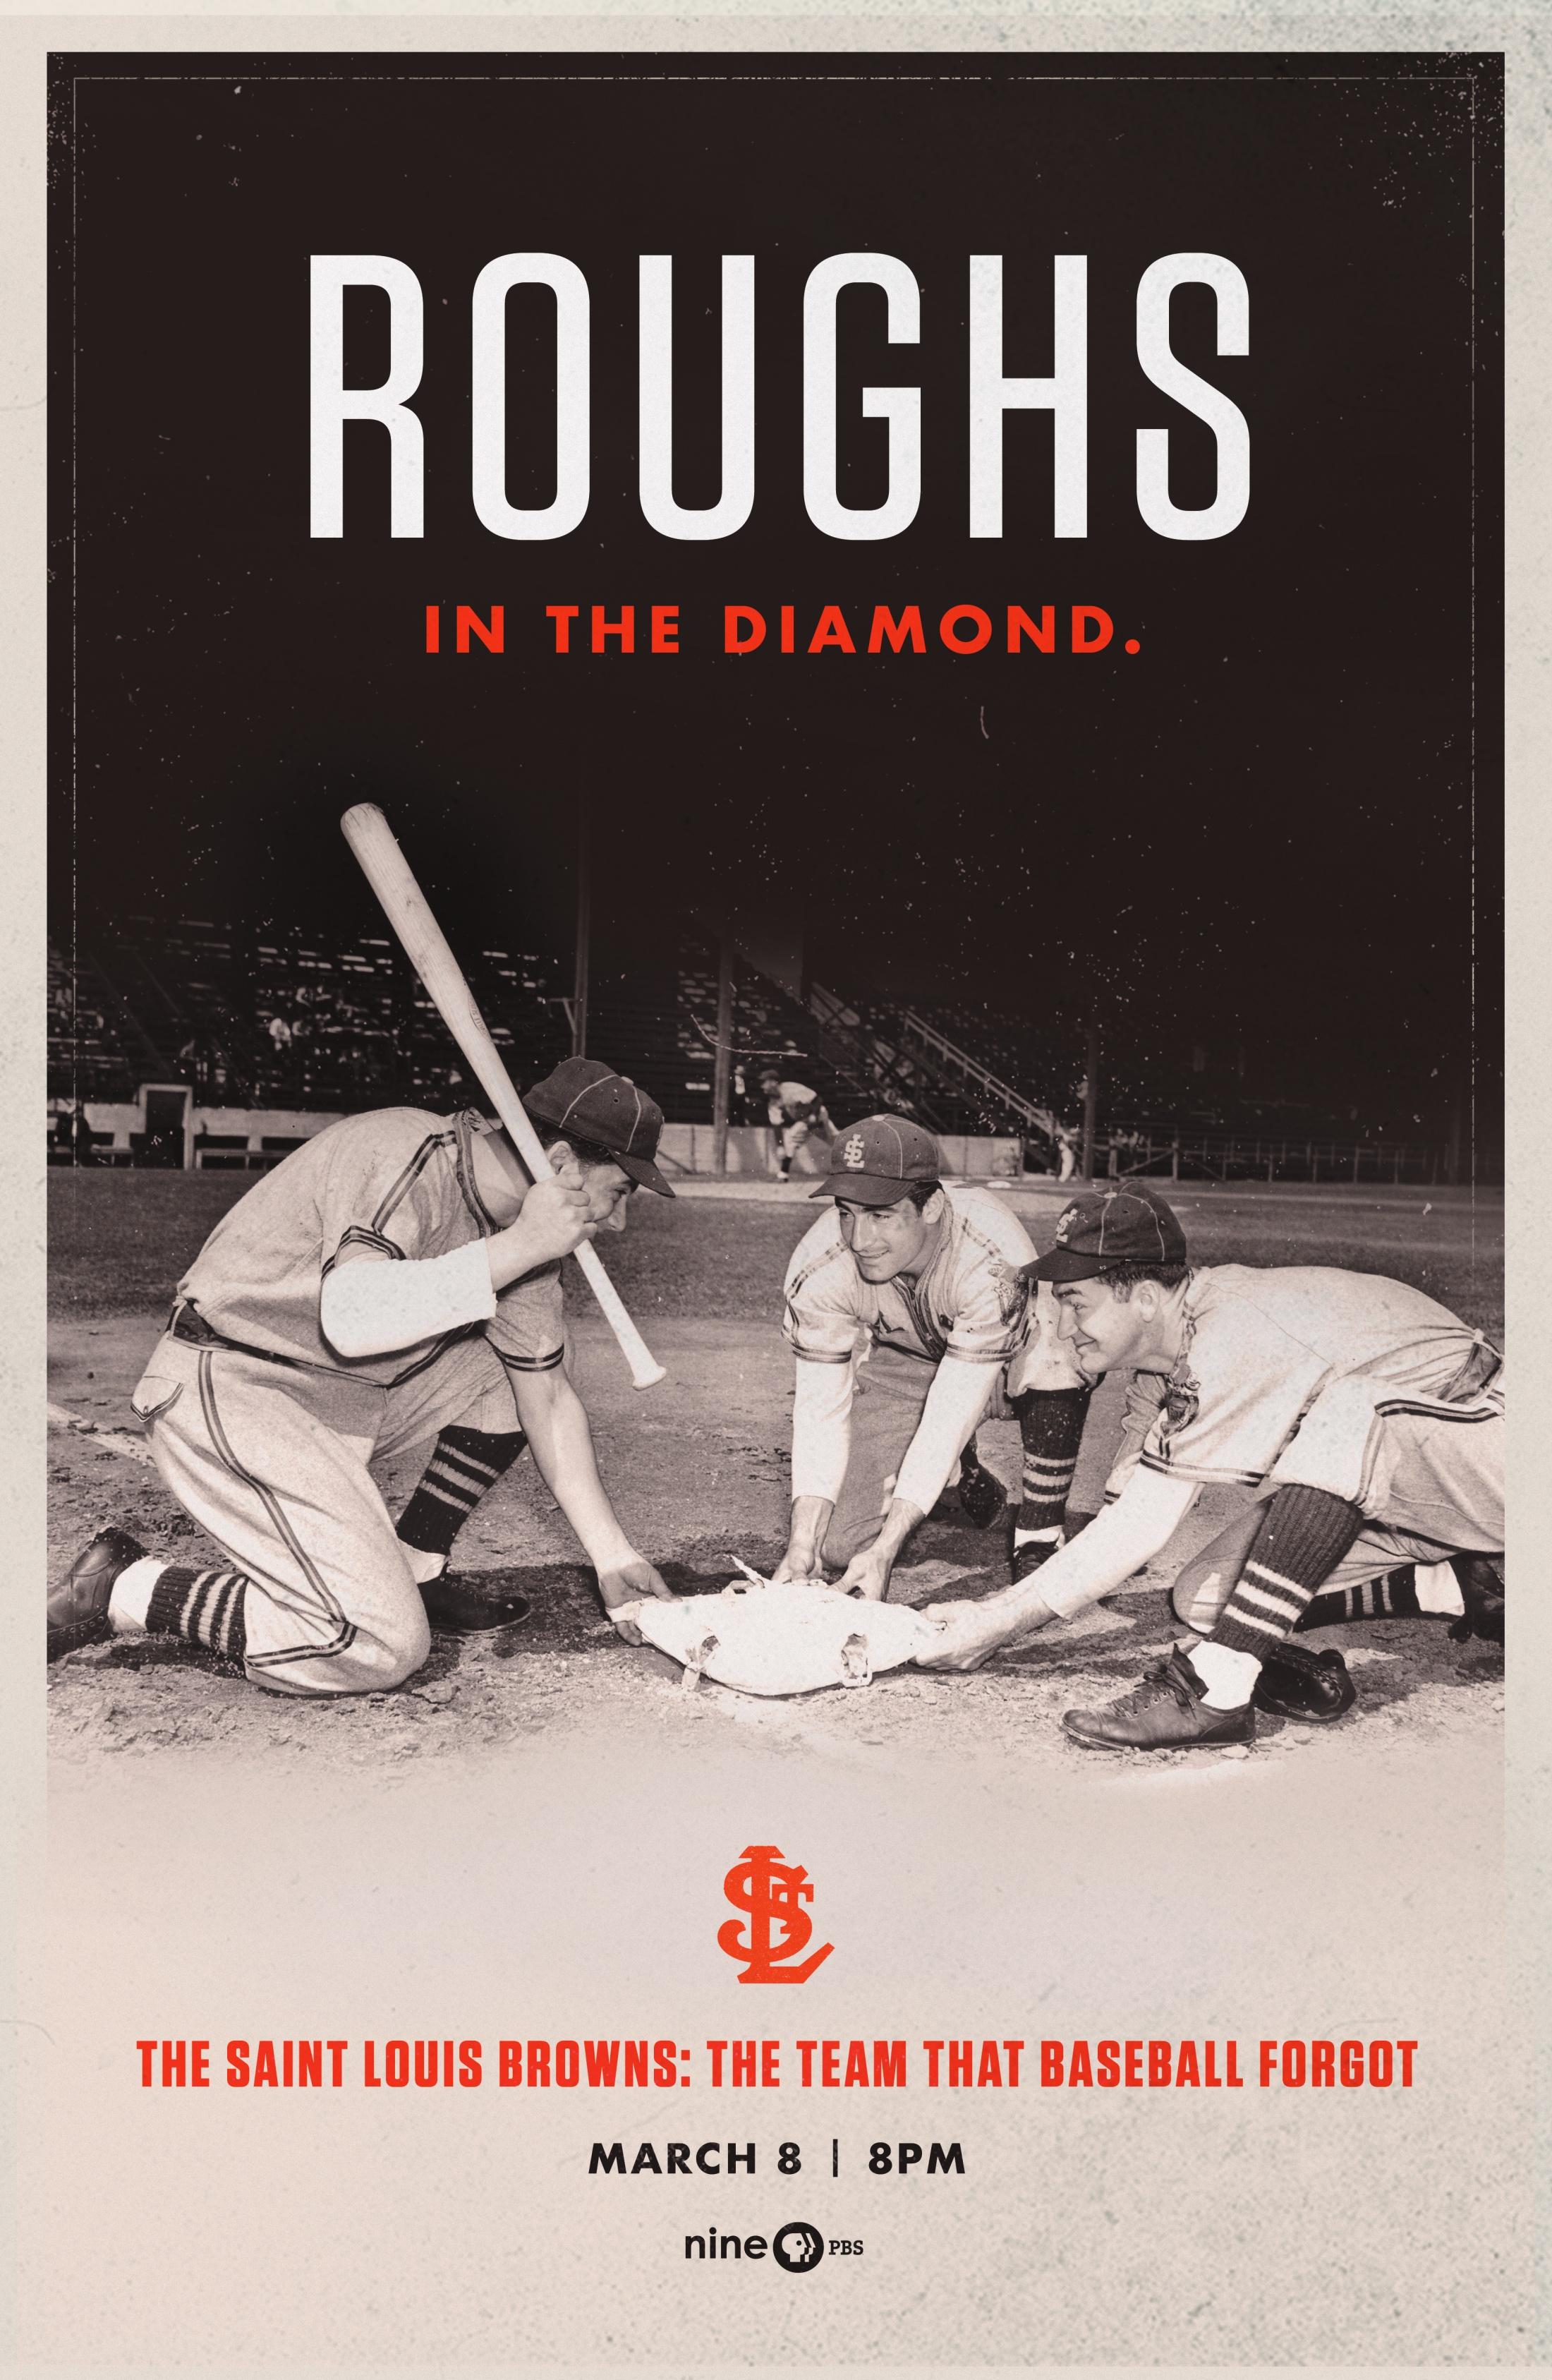 Thumbnail for The Saint Louis Browns